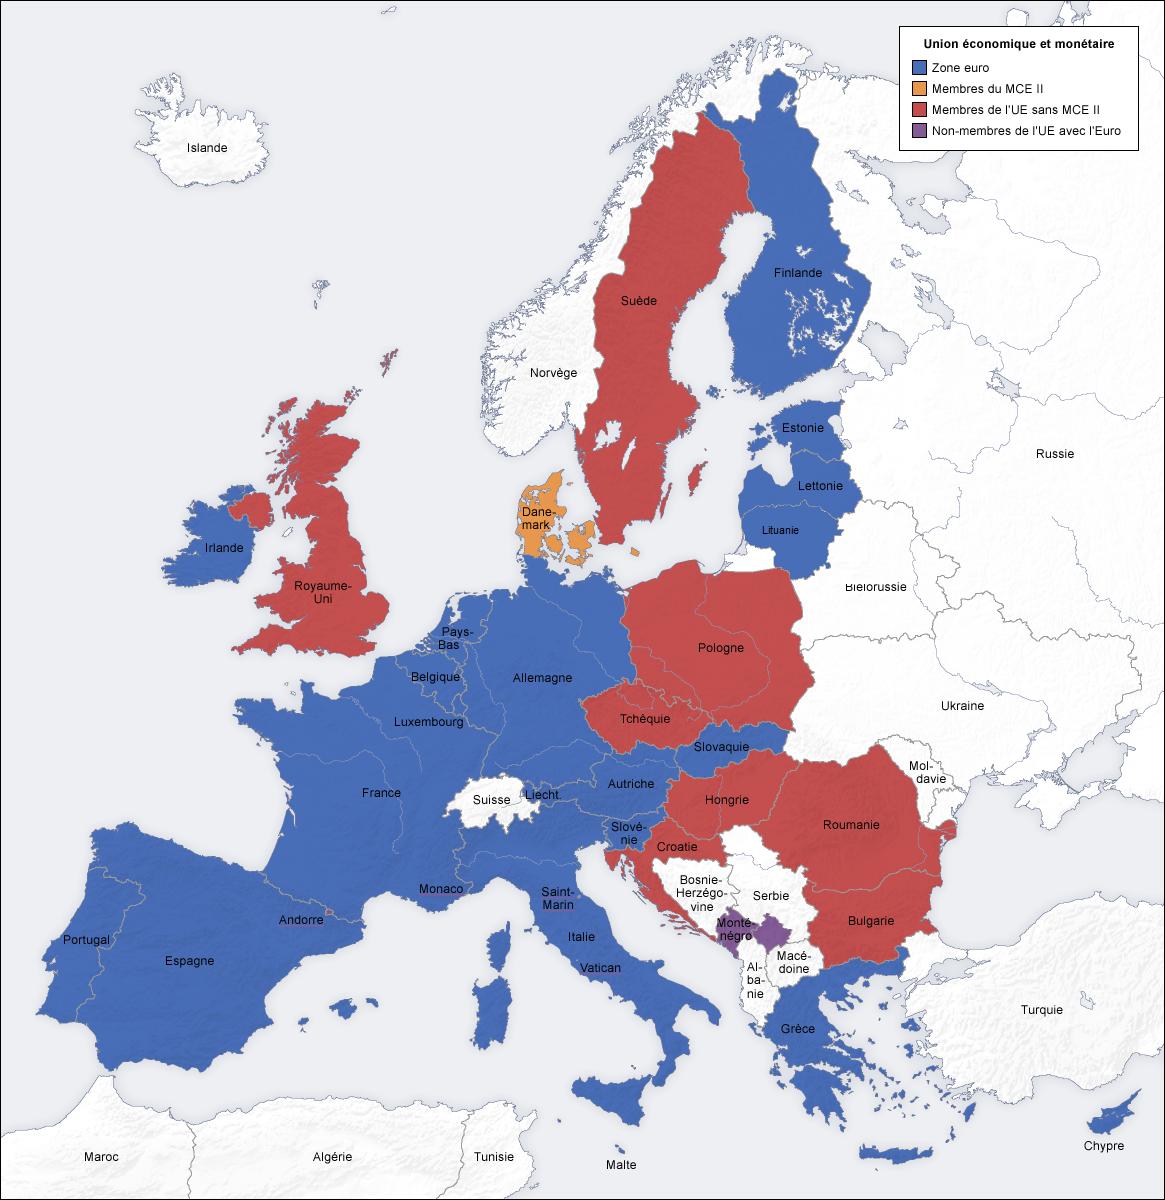 carte europe zone euro 2016